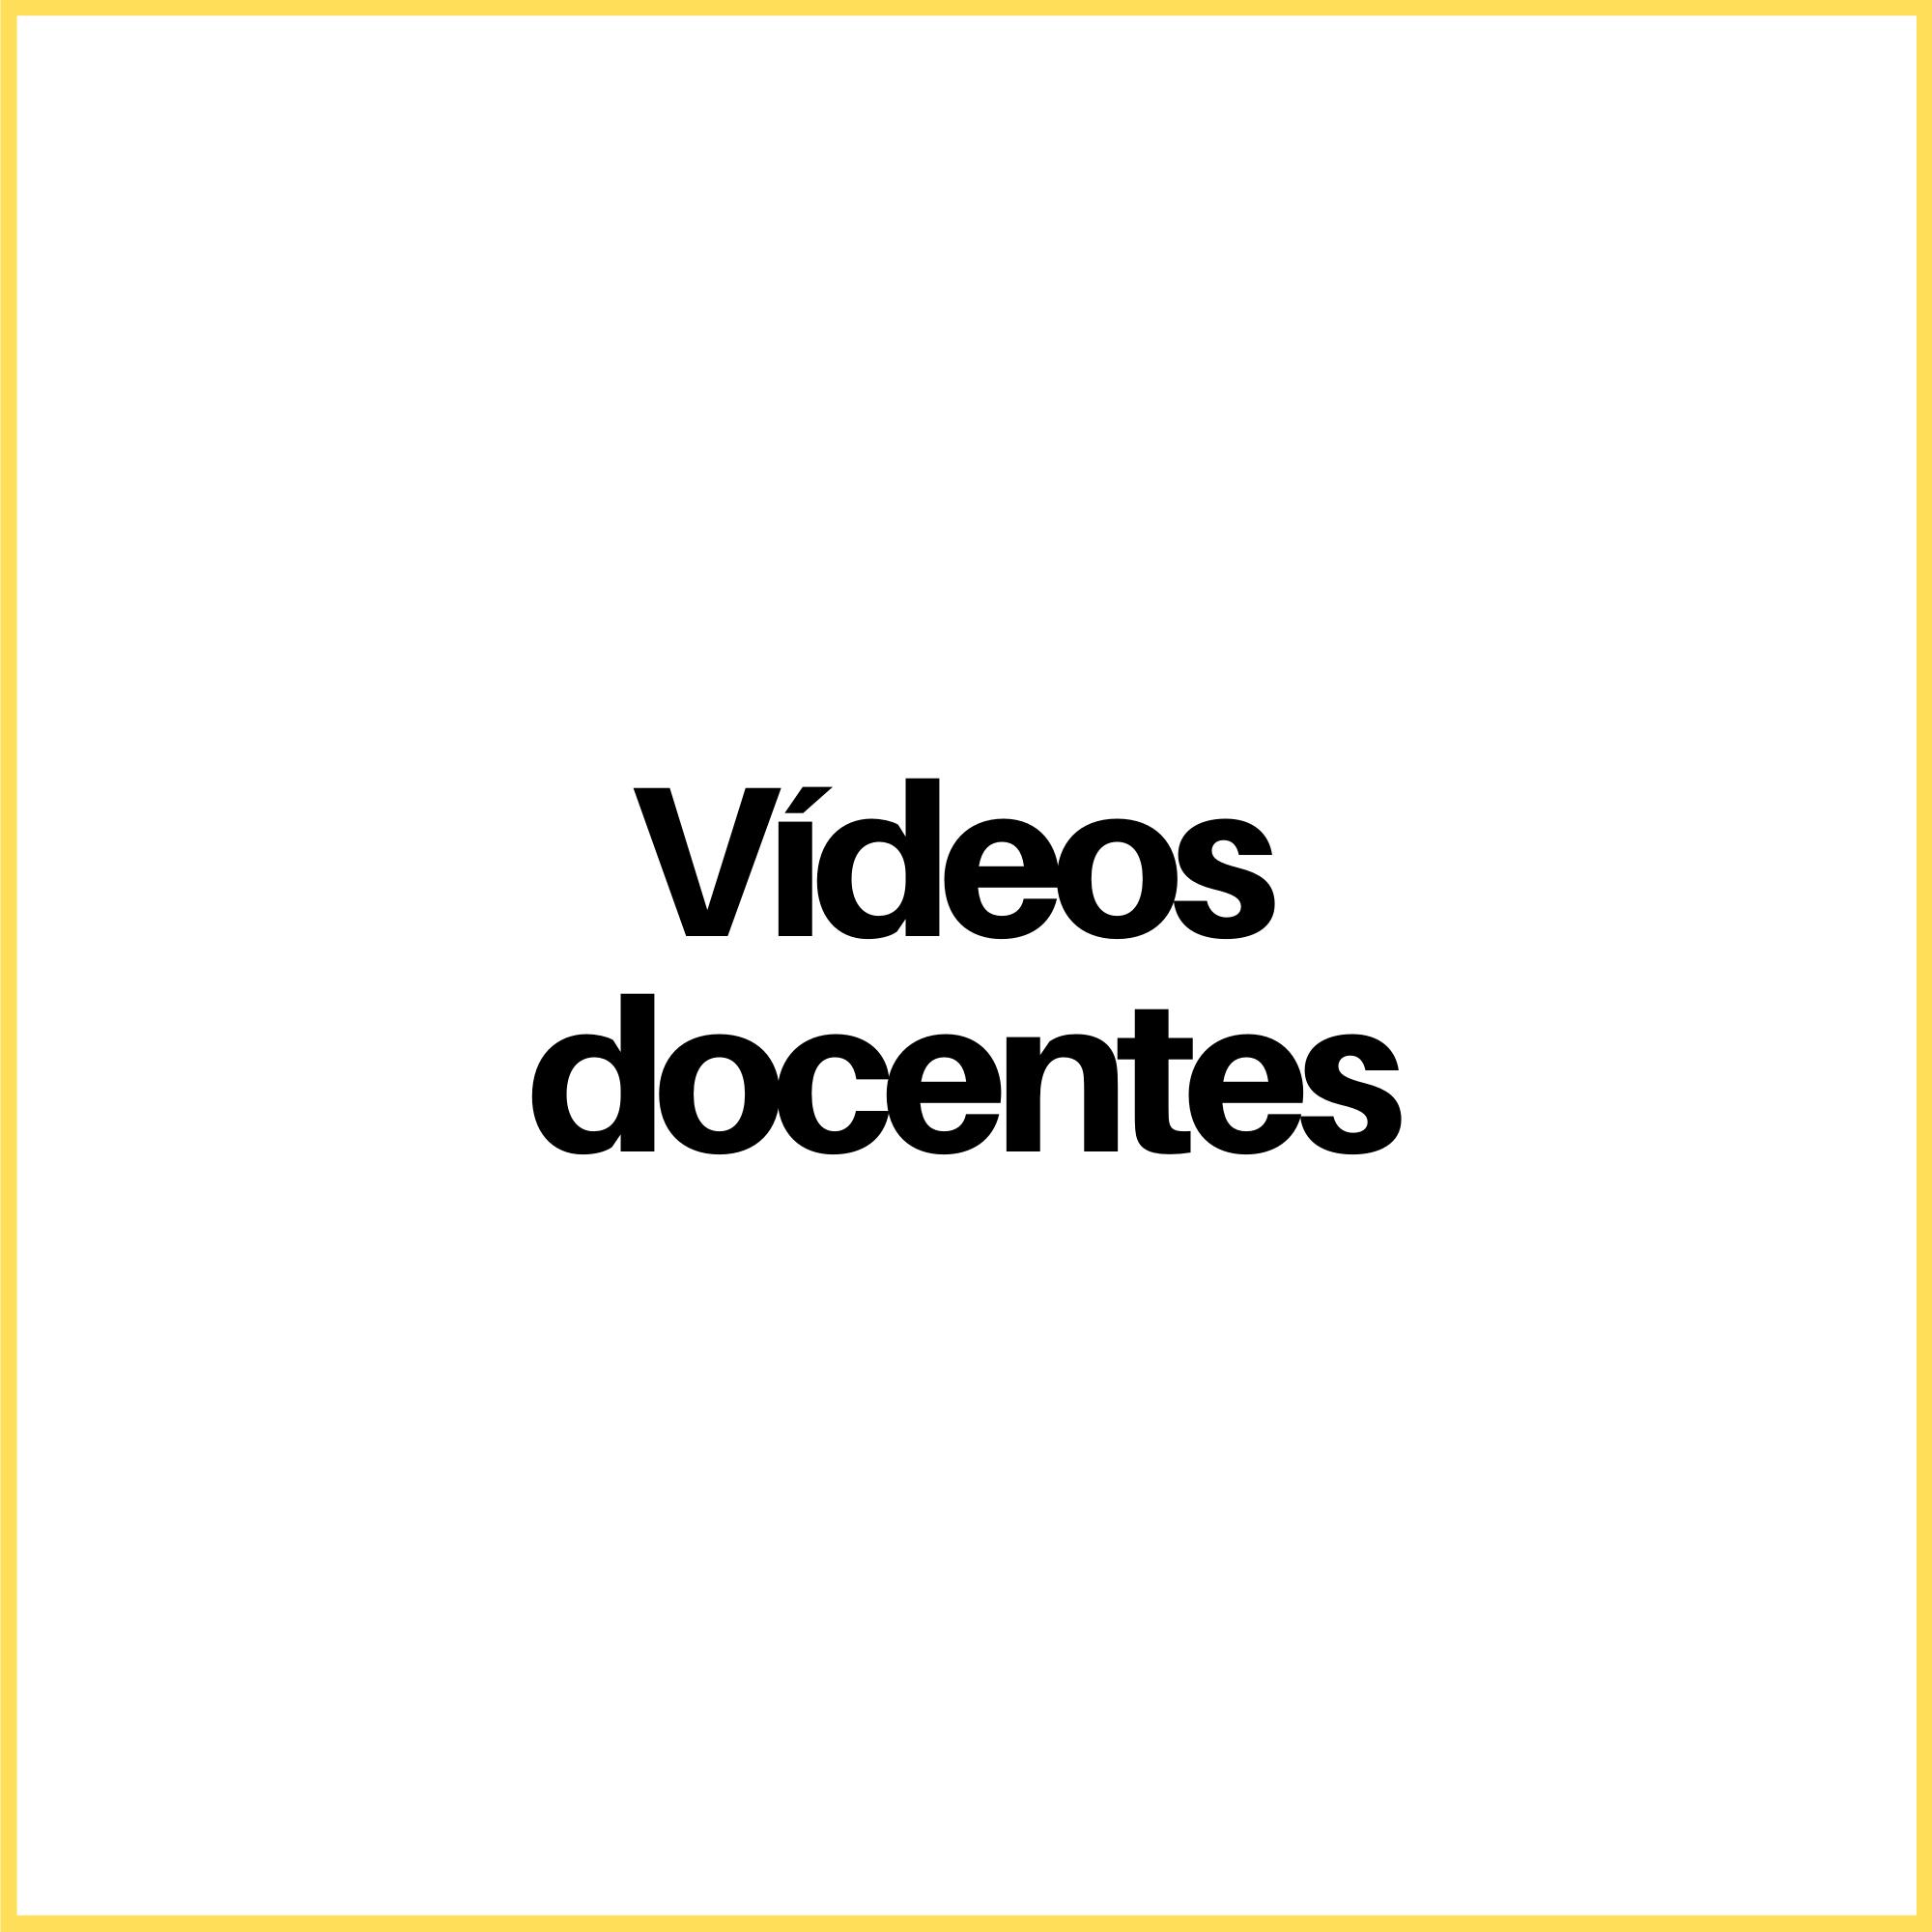 Videos docentes